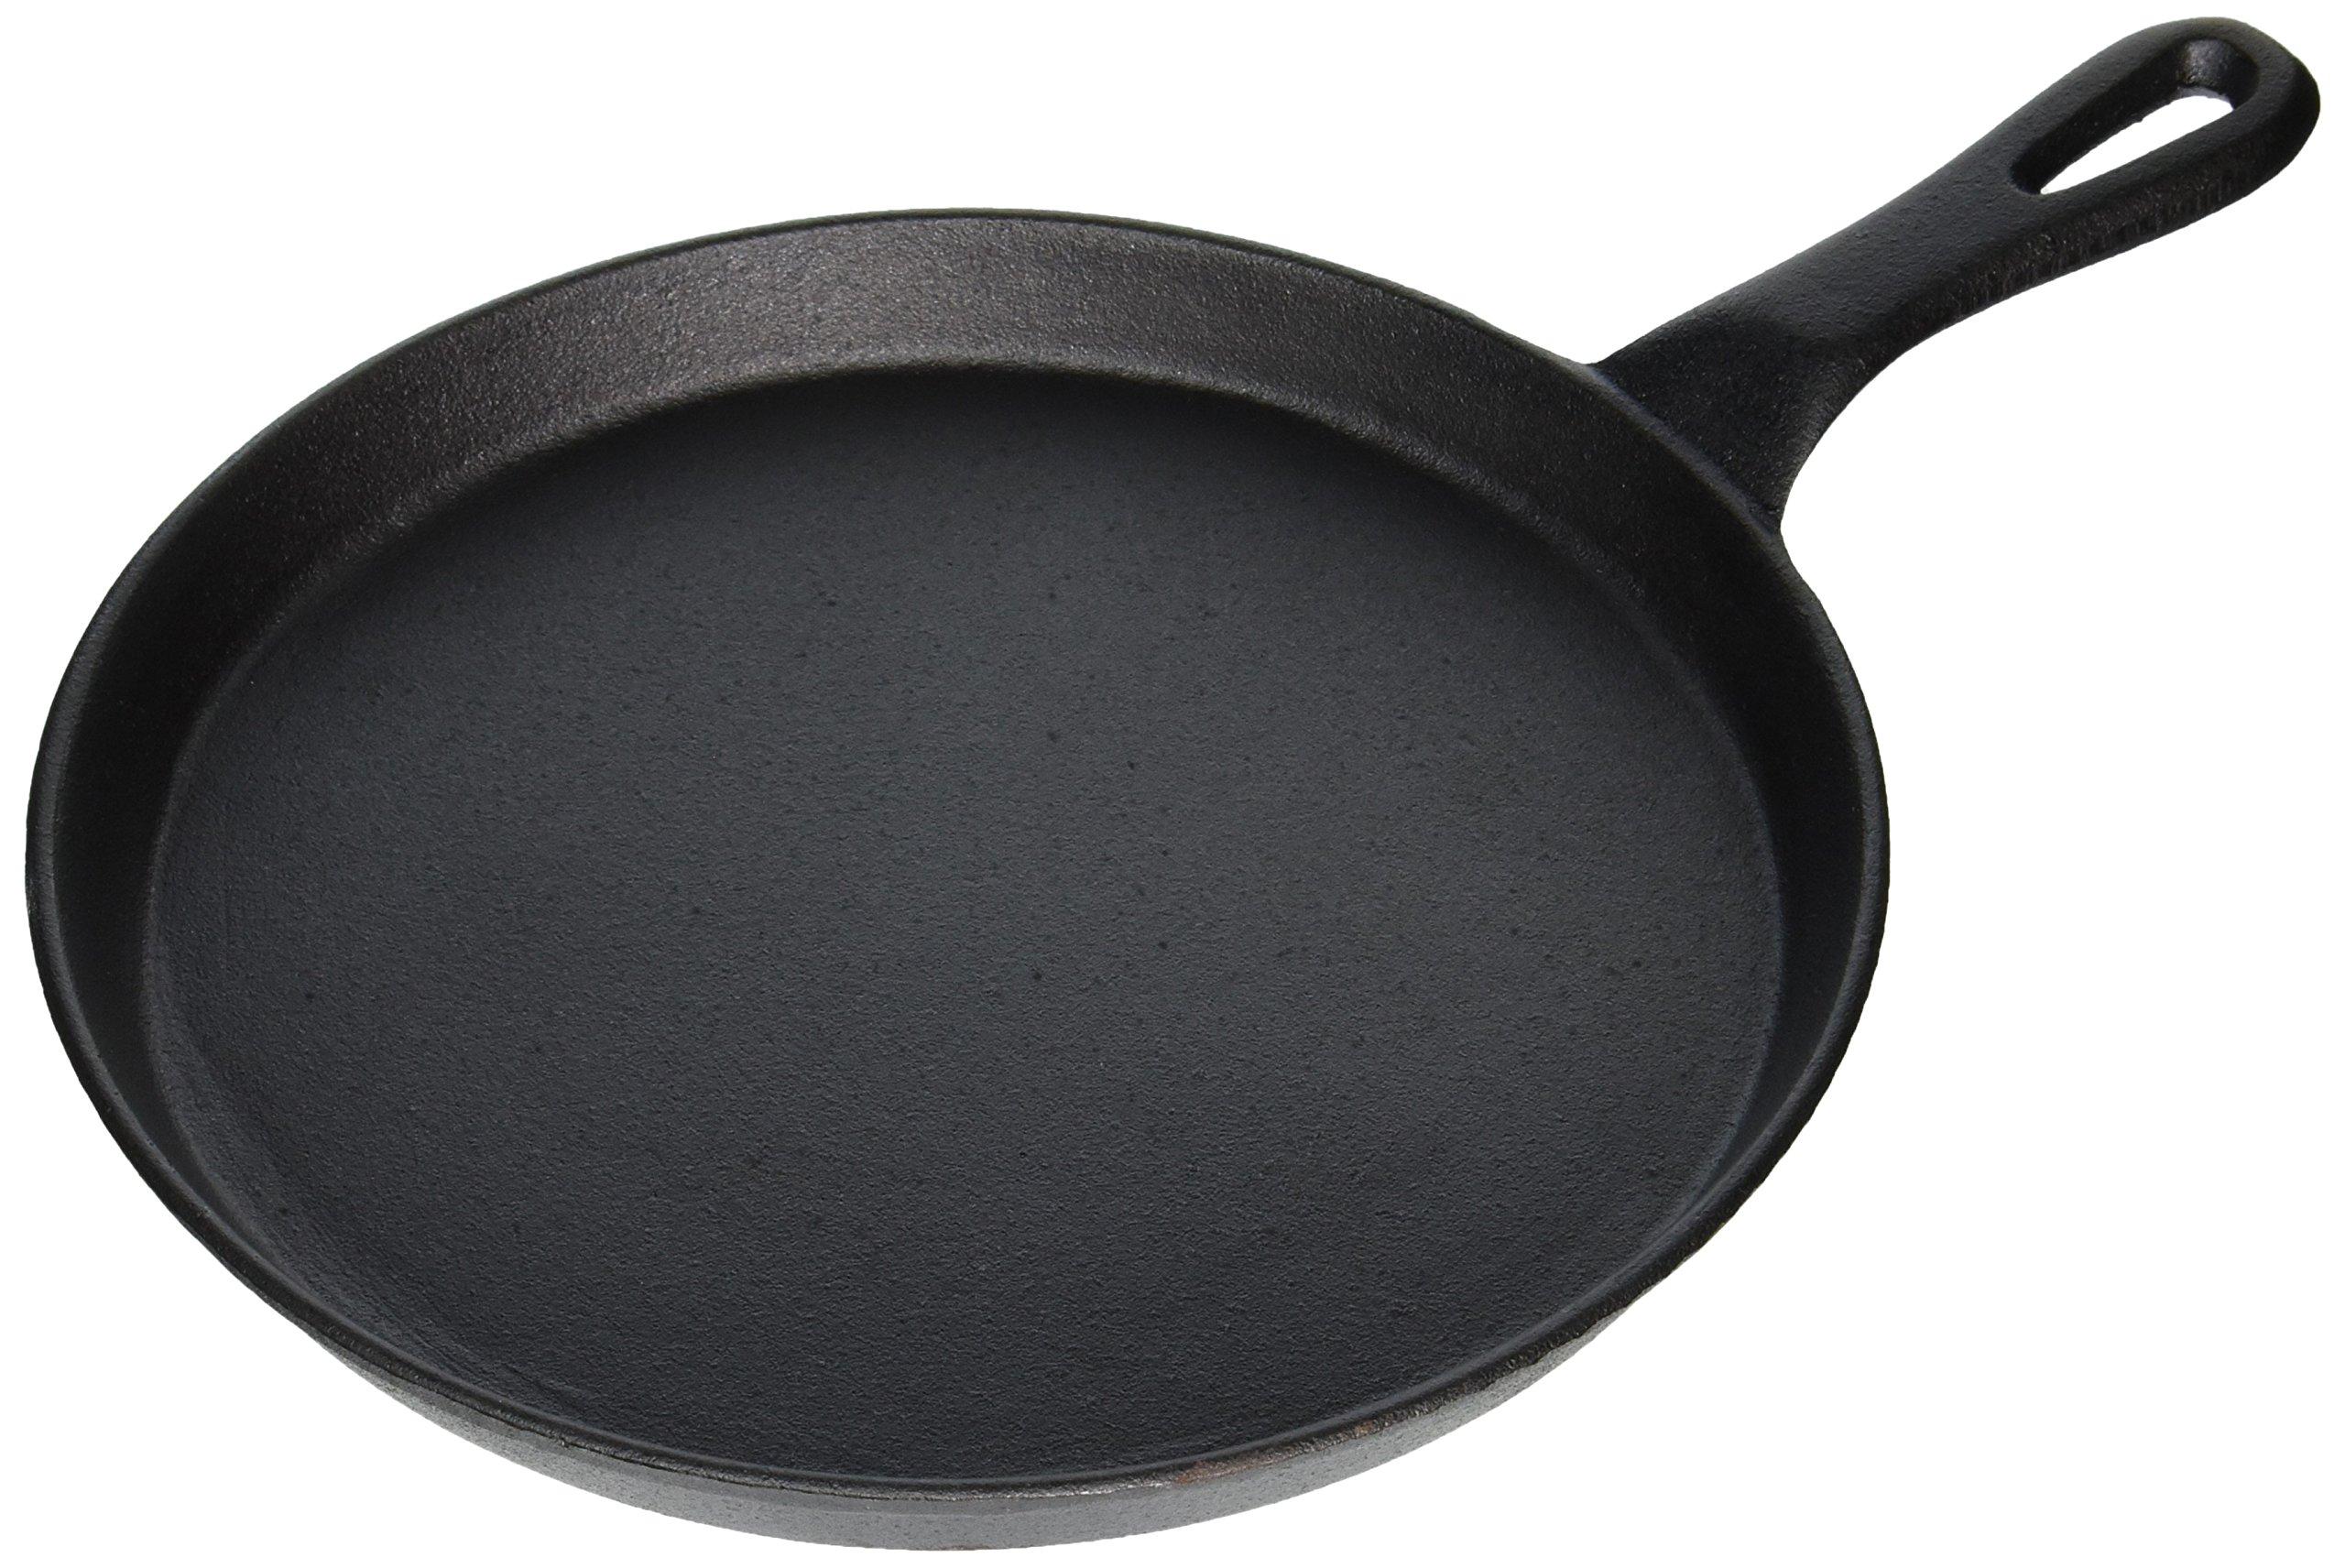 Winco Round Cast Iron Grill Pan, 10-Inch, Black Finish